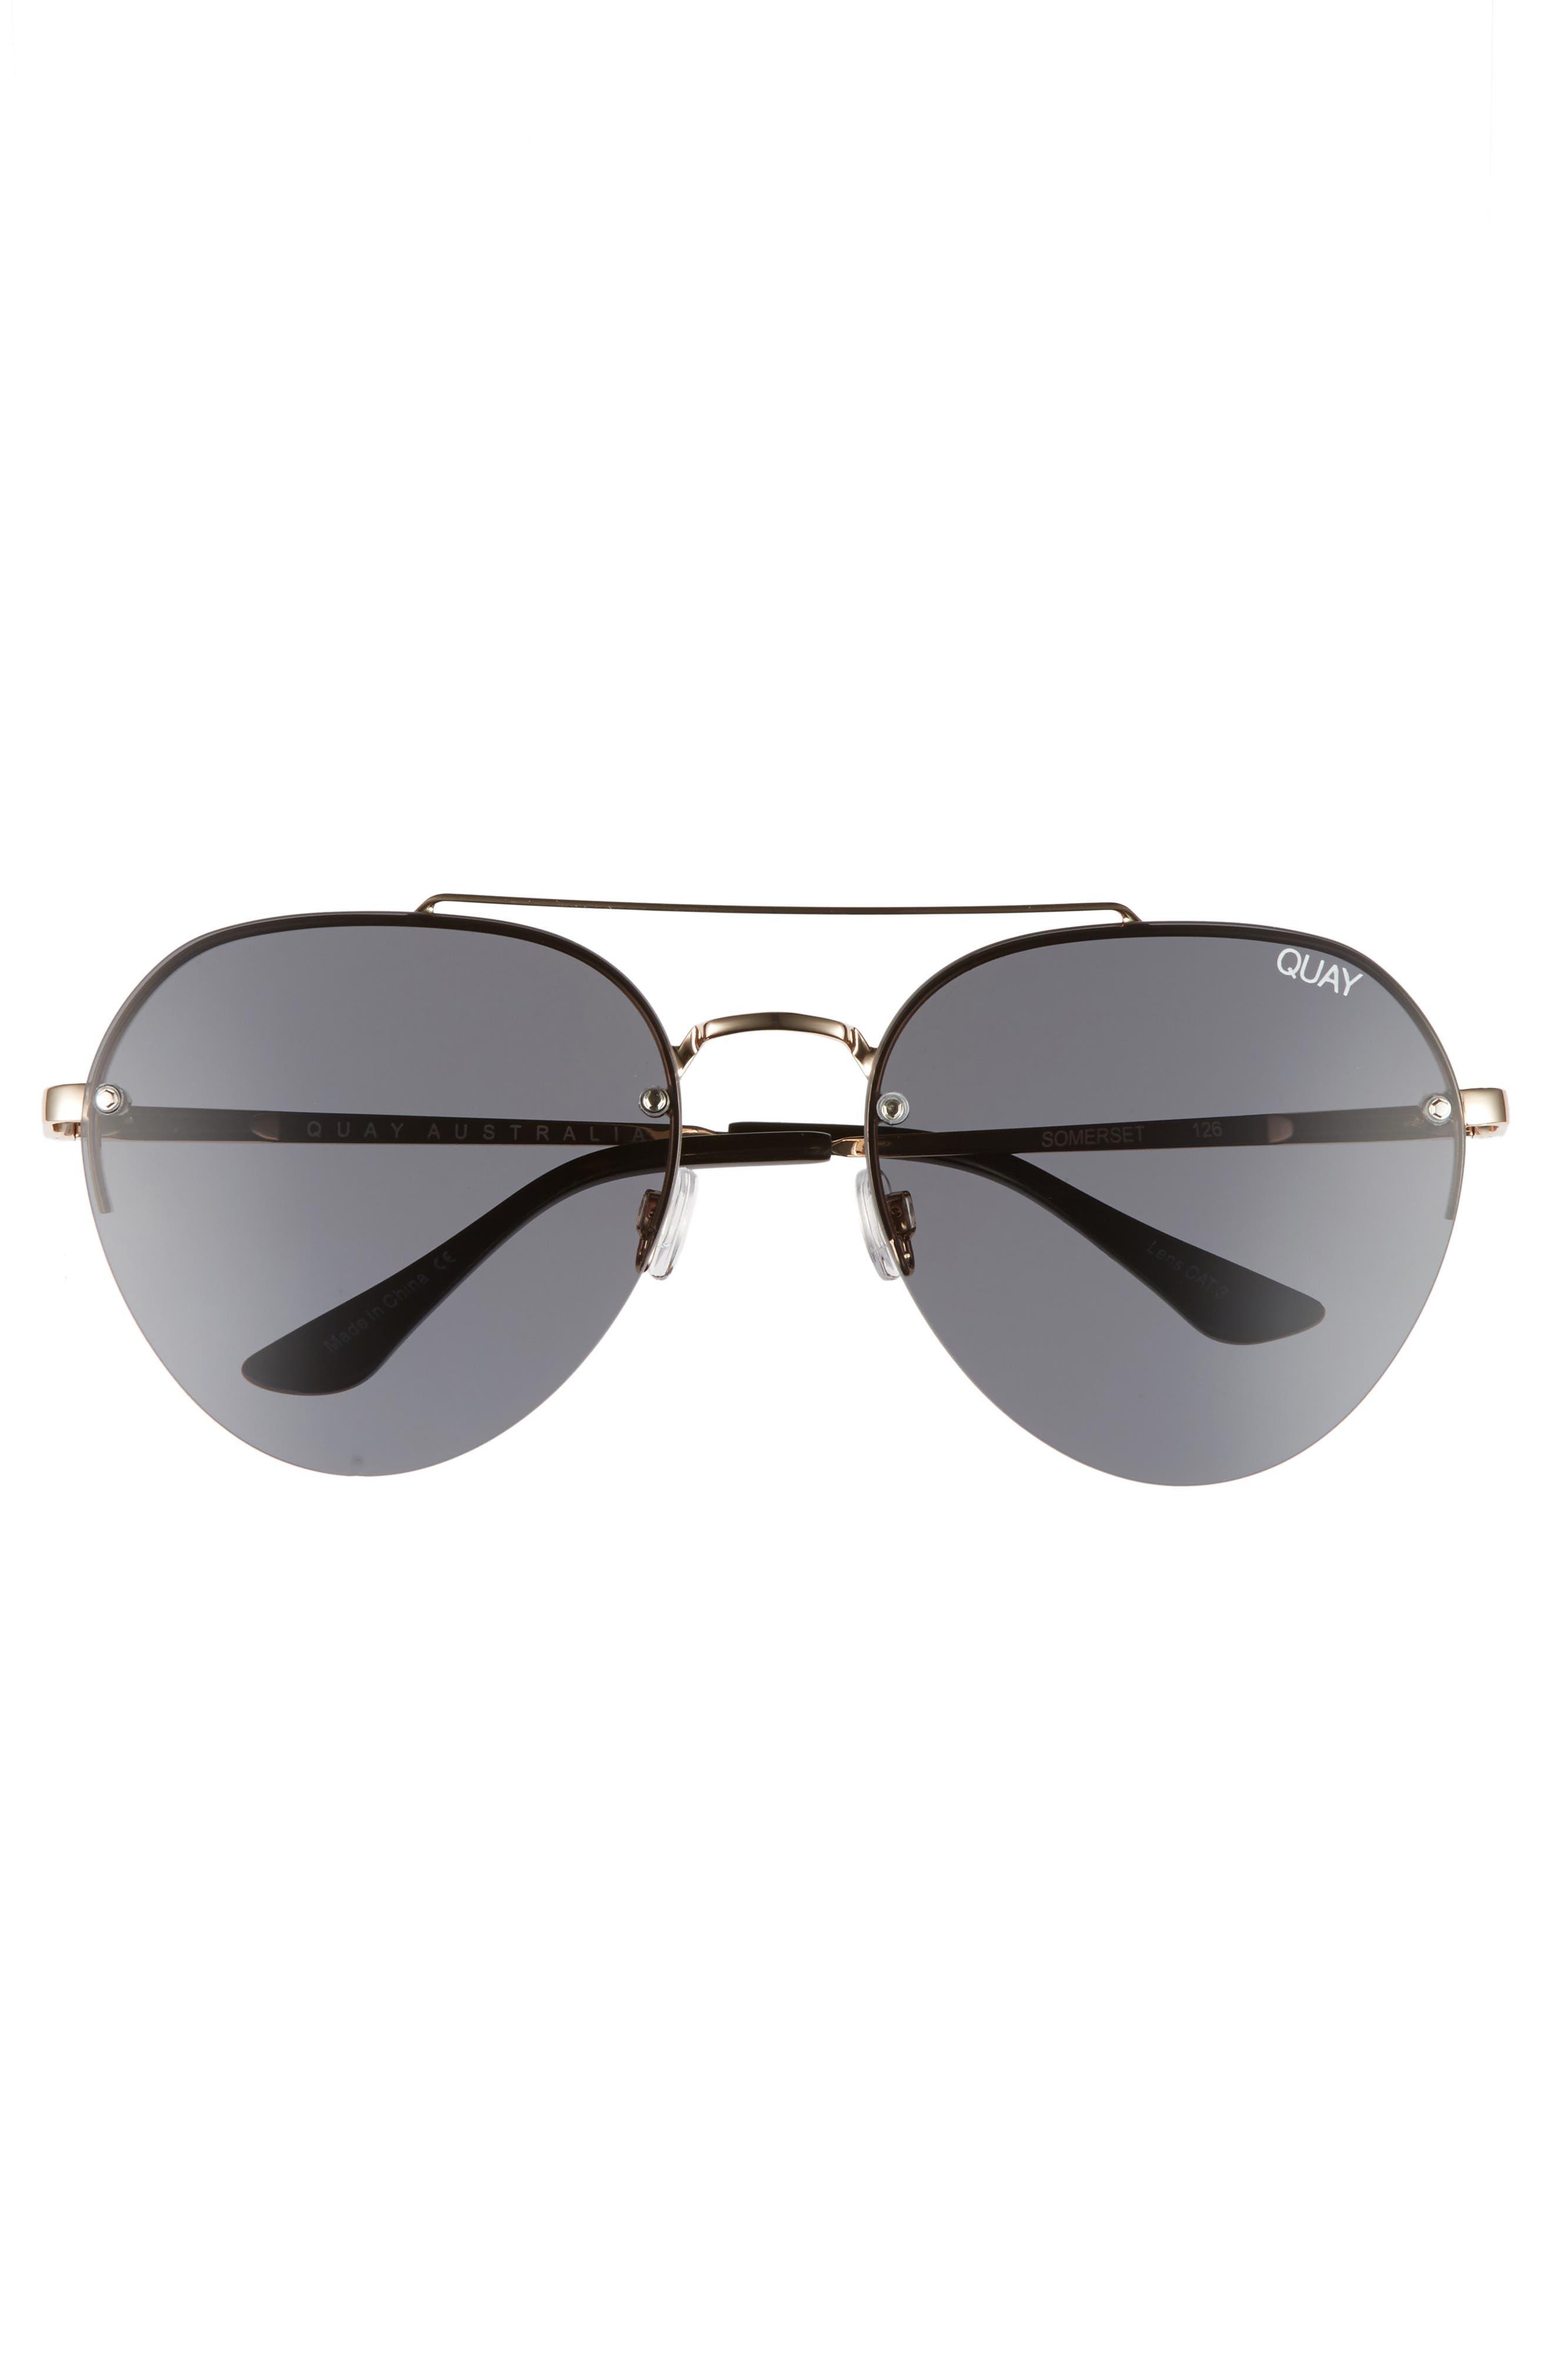 Somerset 65mm Aviator Sunglasses,                             Alternate thumbnail 3, color,                             GOLD/ SMOKE